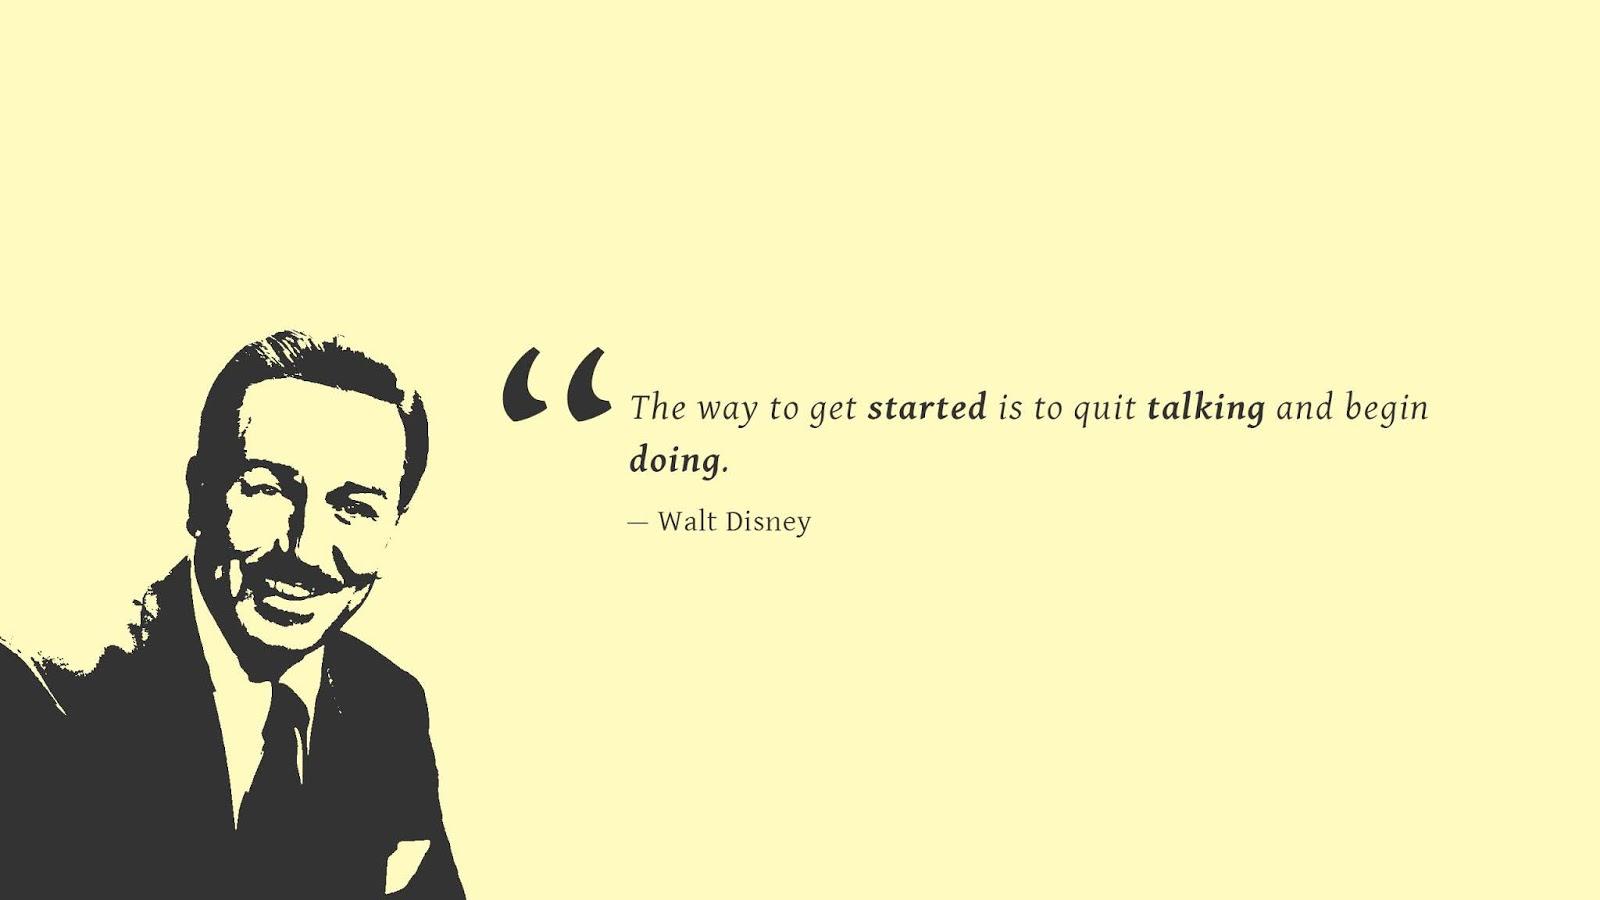 Begin Doing, Quick Talking, Walt Disney, Popular Quotes, HD, Typography